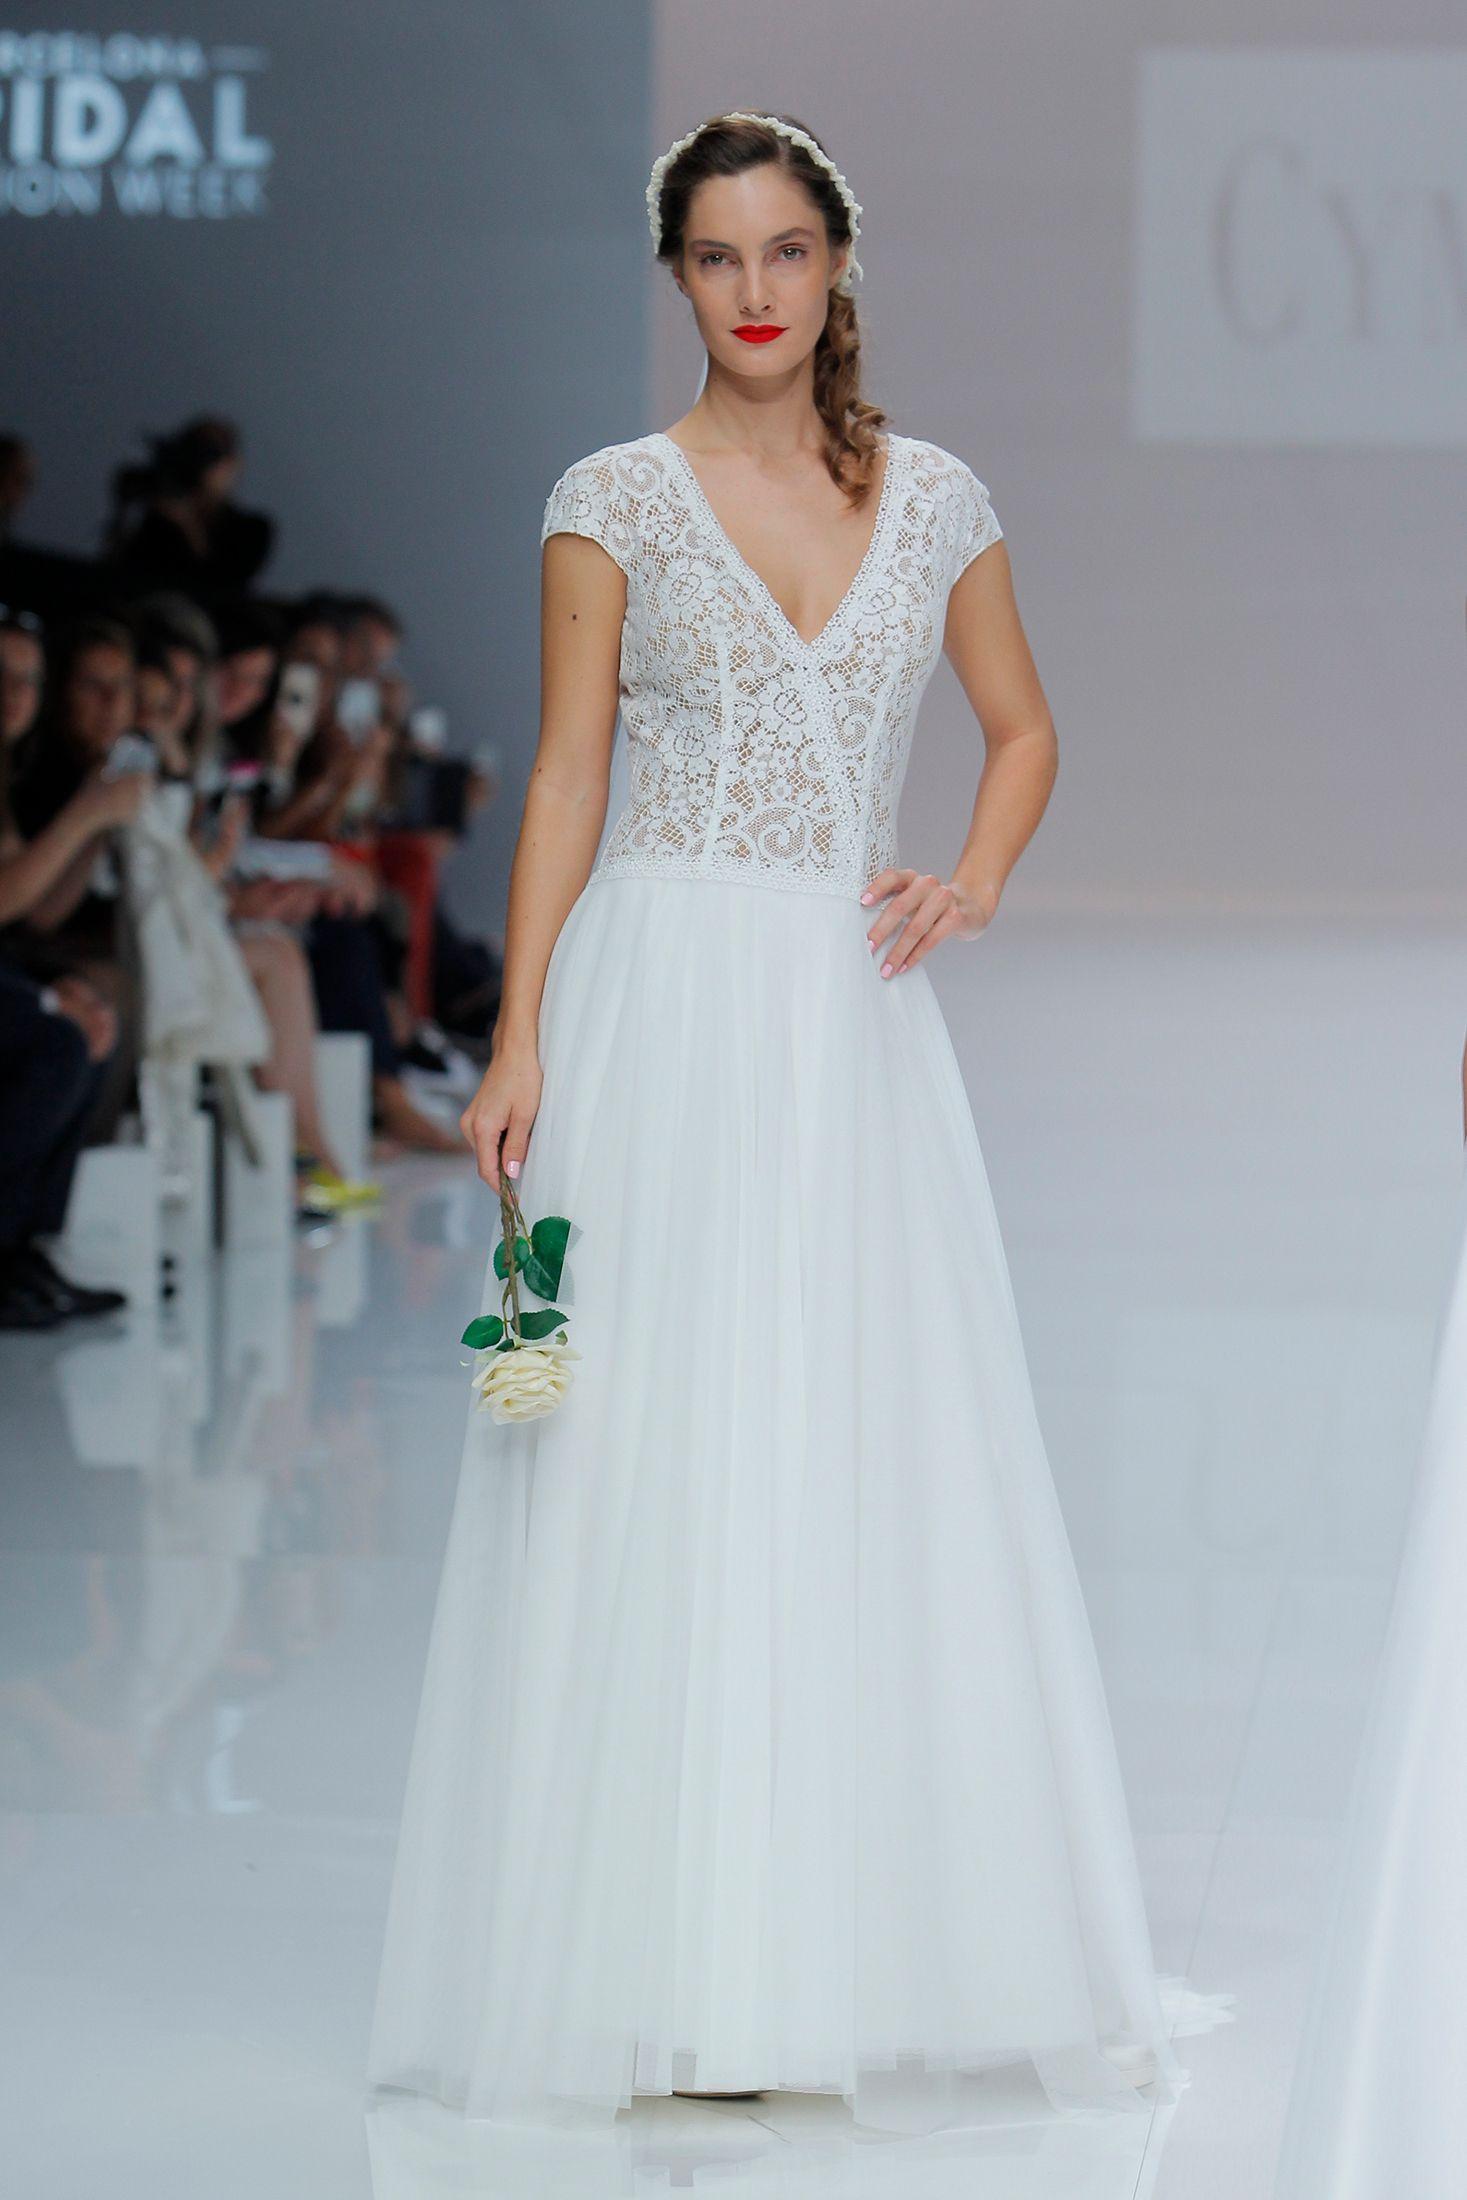 Vestido de Novia de Cymbeline - CY 019 #wedding #bodas #boda ...